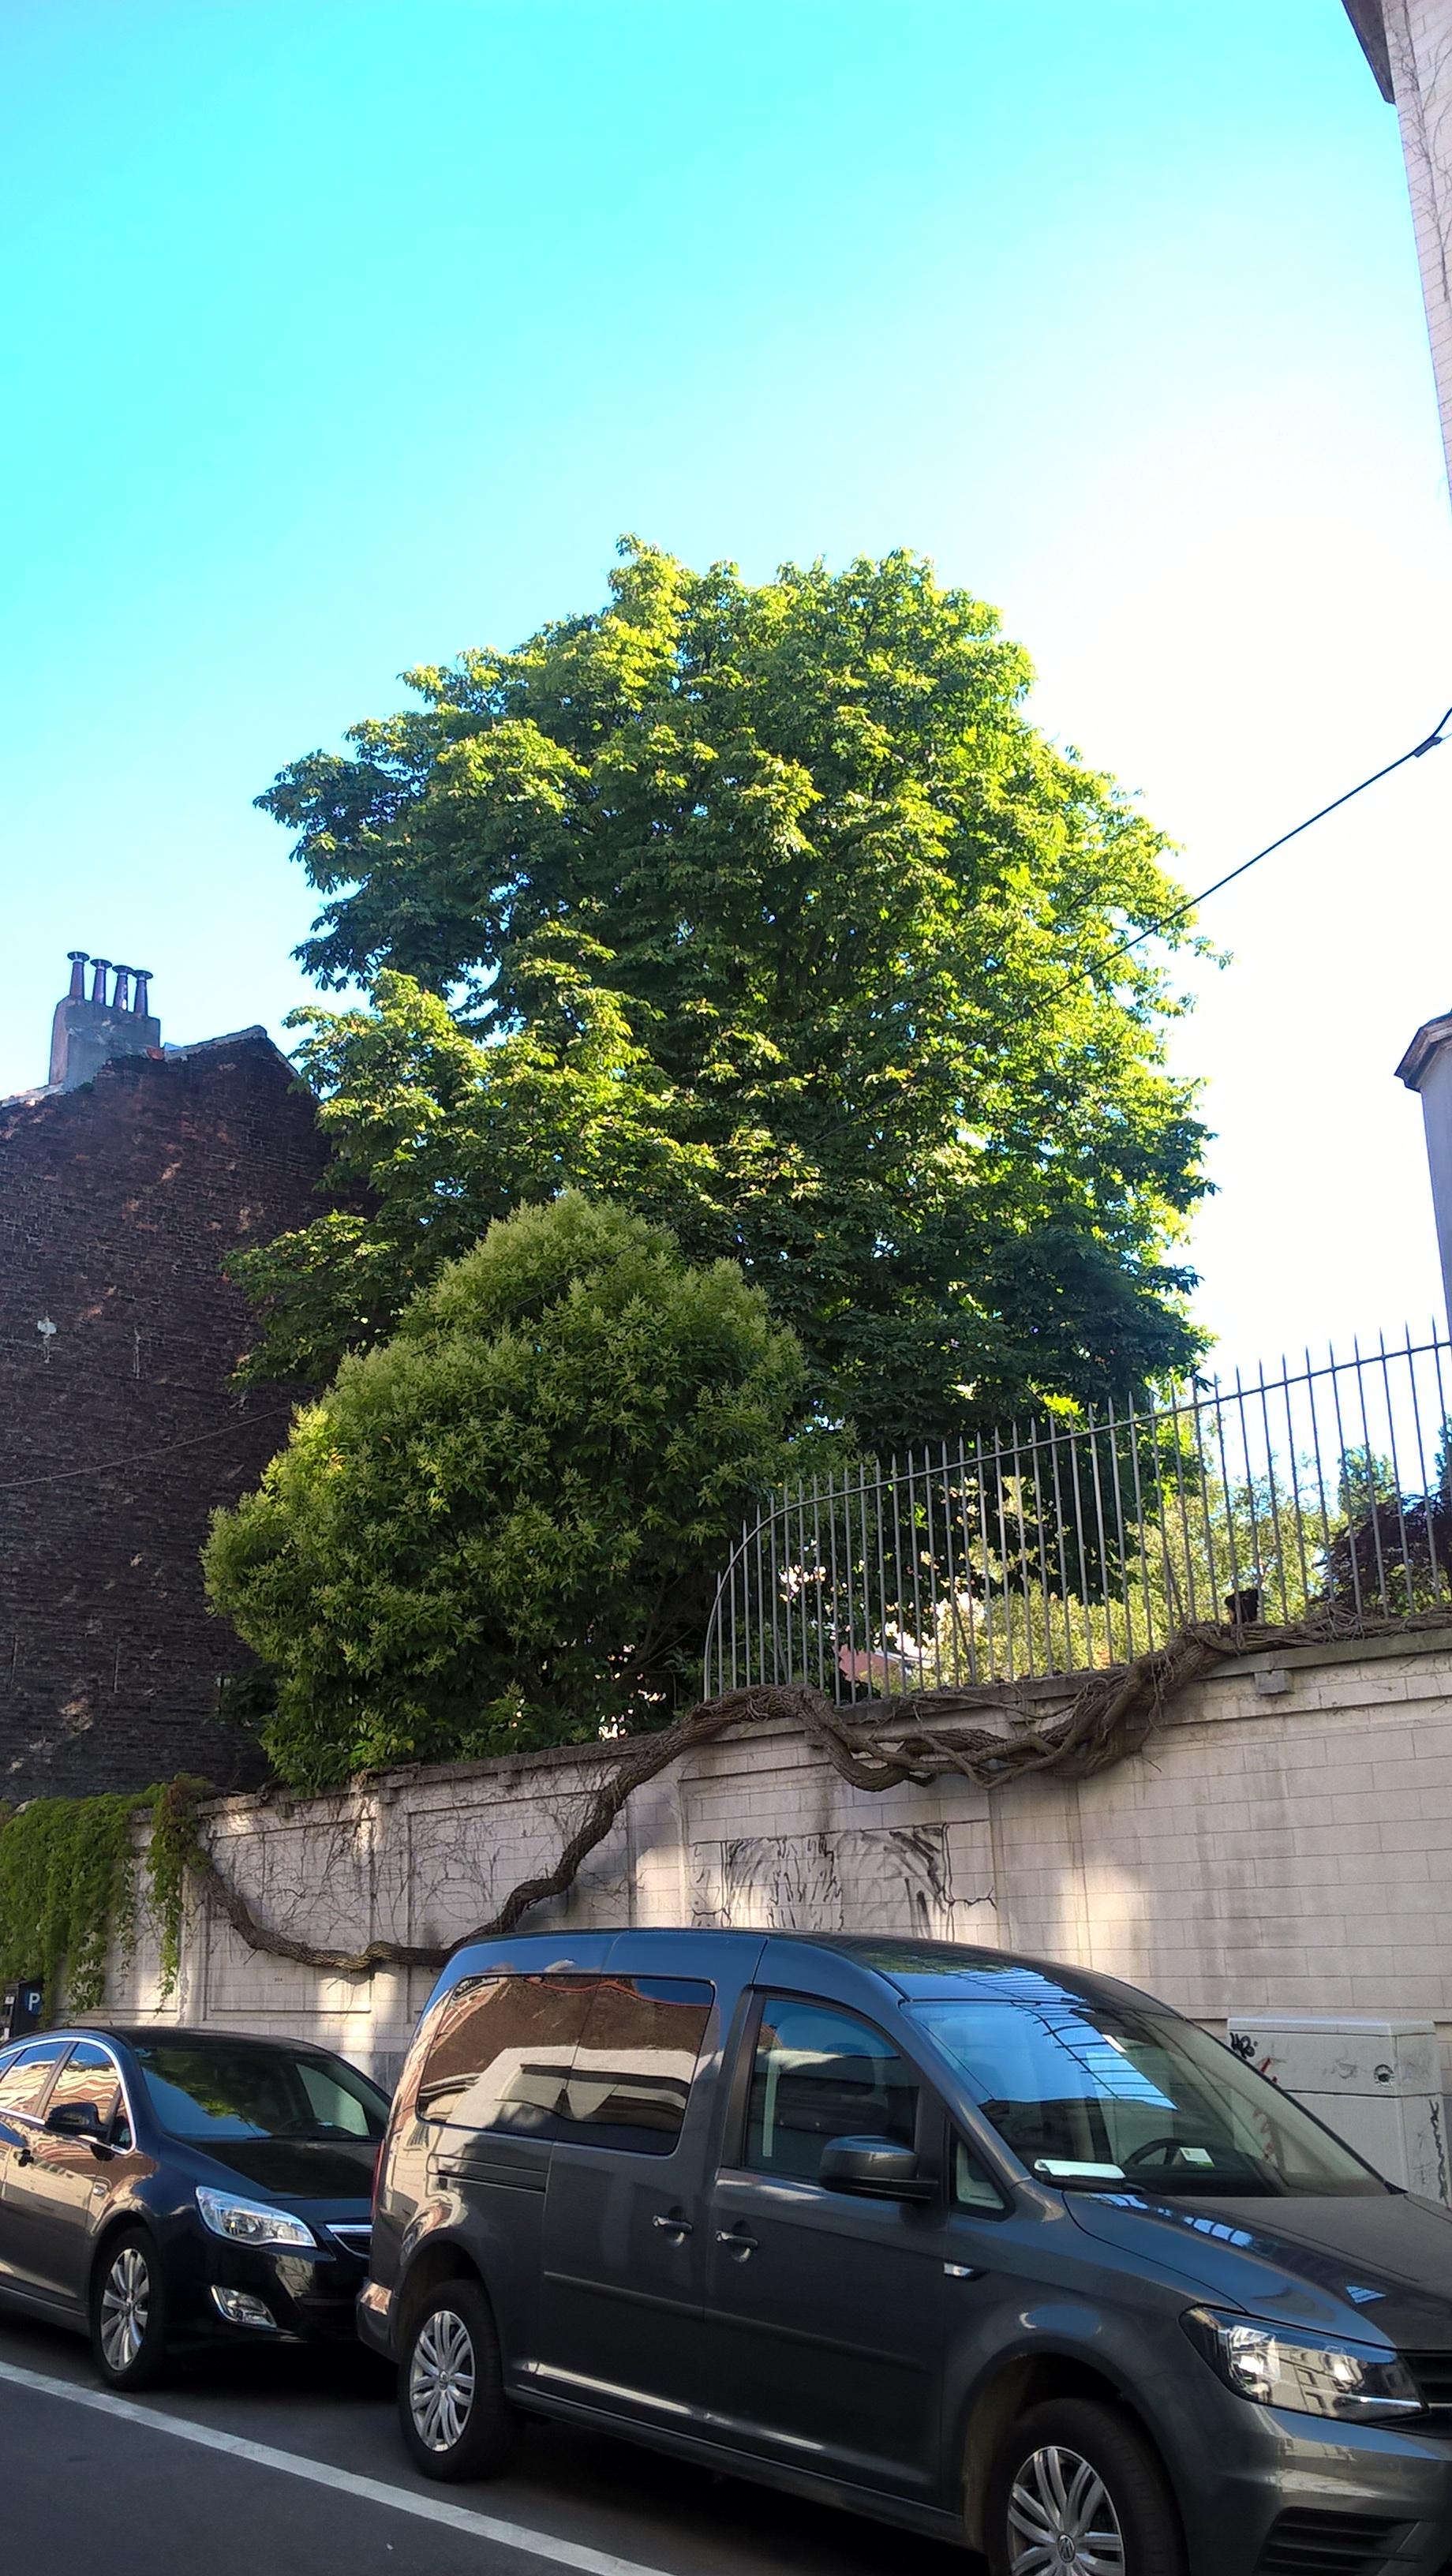 Marronnier commun – Ixelles, Rue de la Concorde, 55 –  20 Juillet 2016